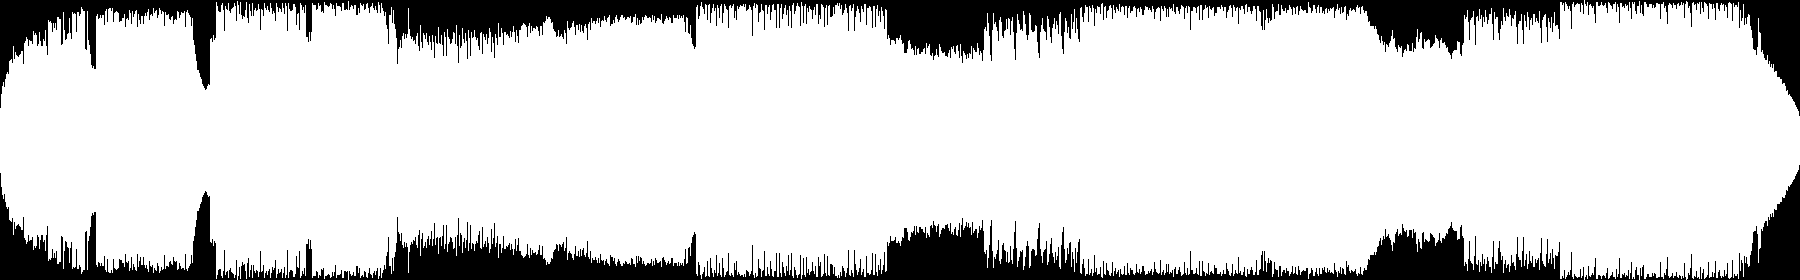 Reggaeton audio waveform